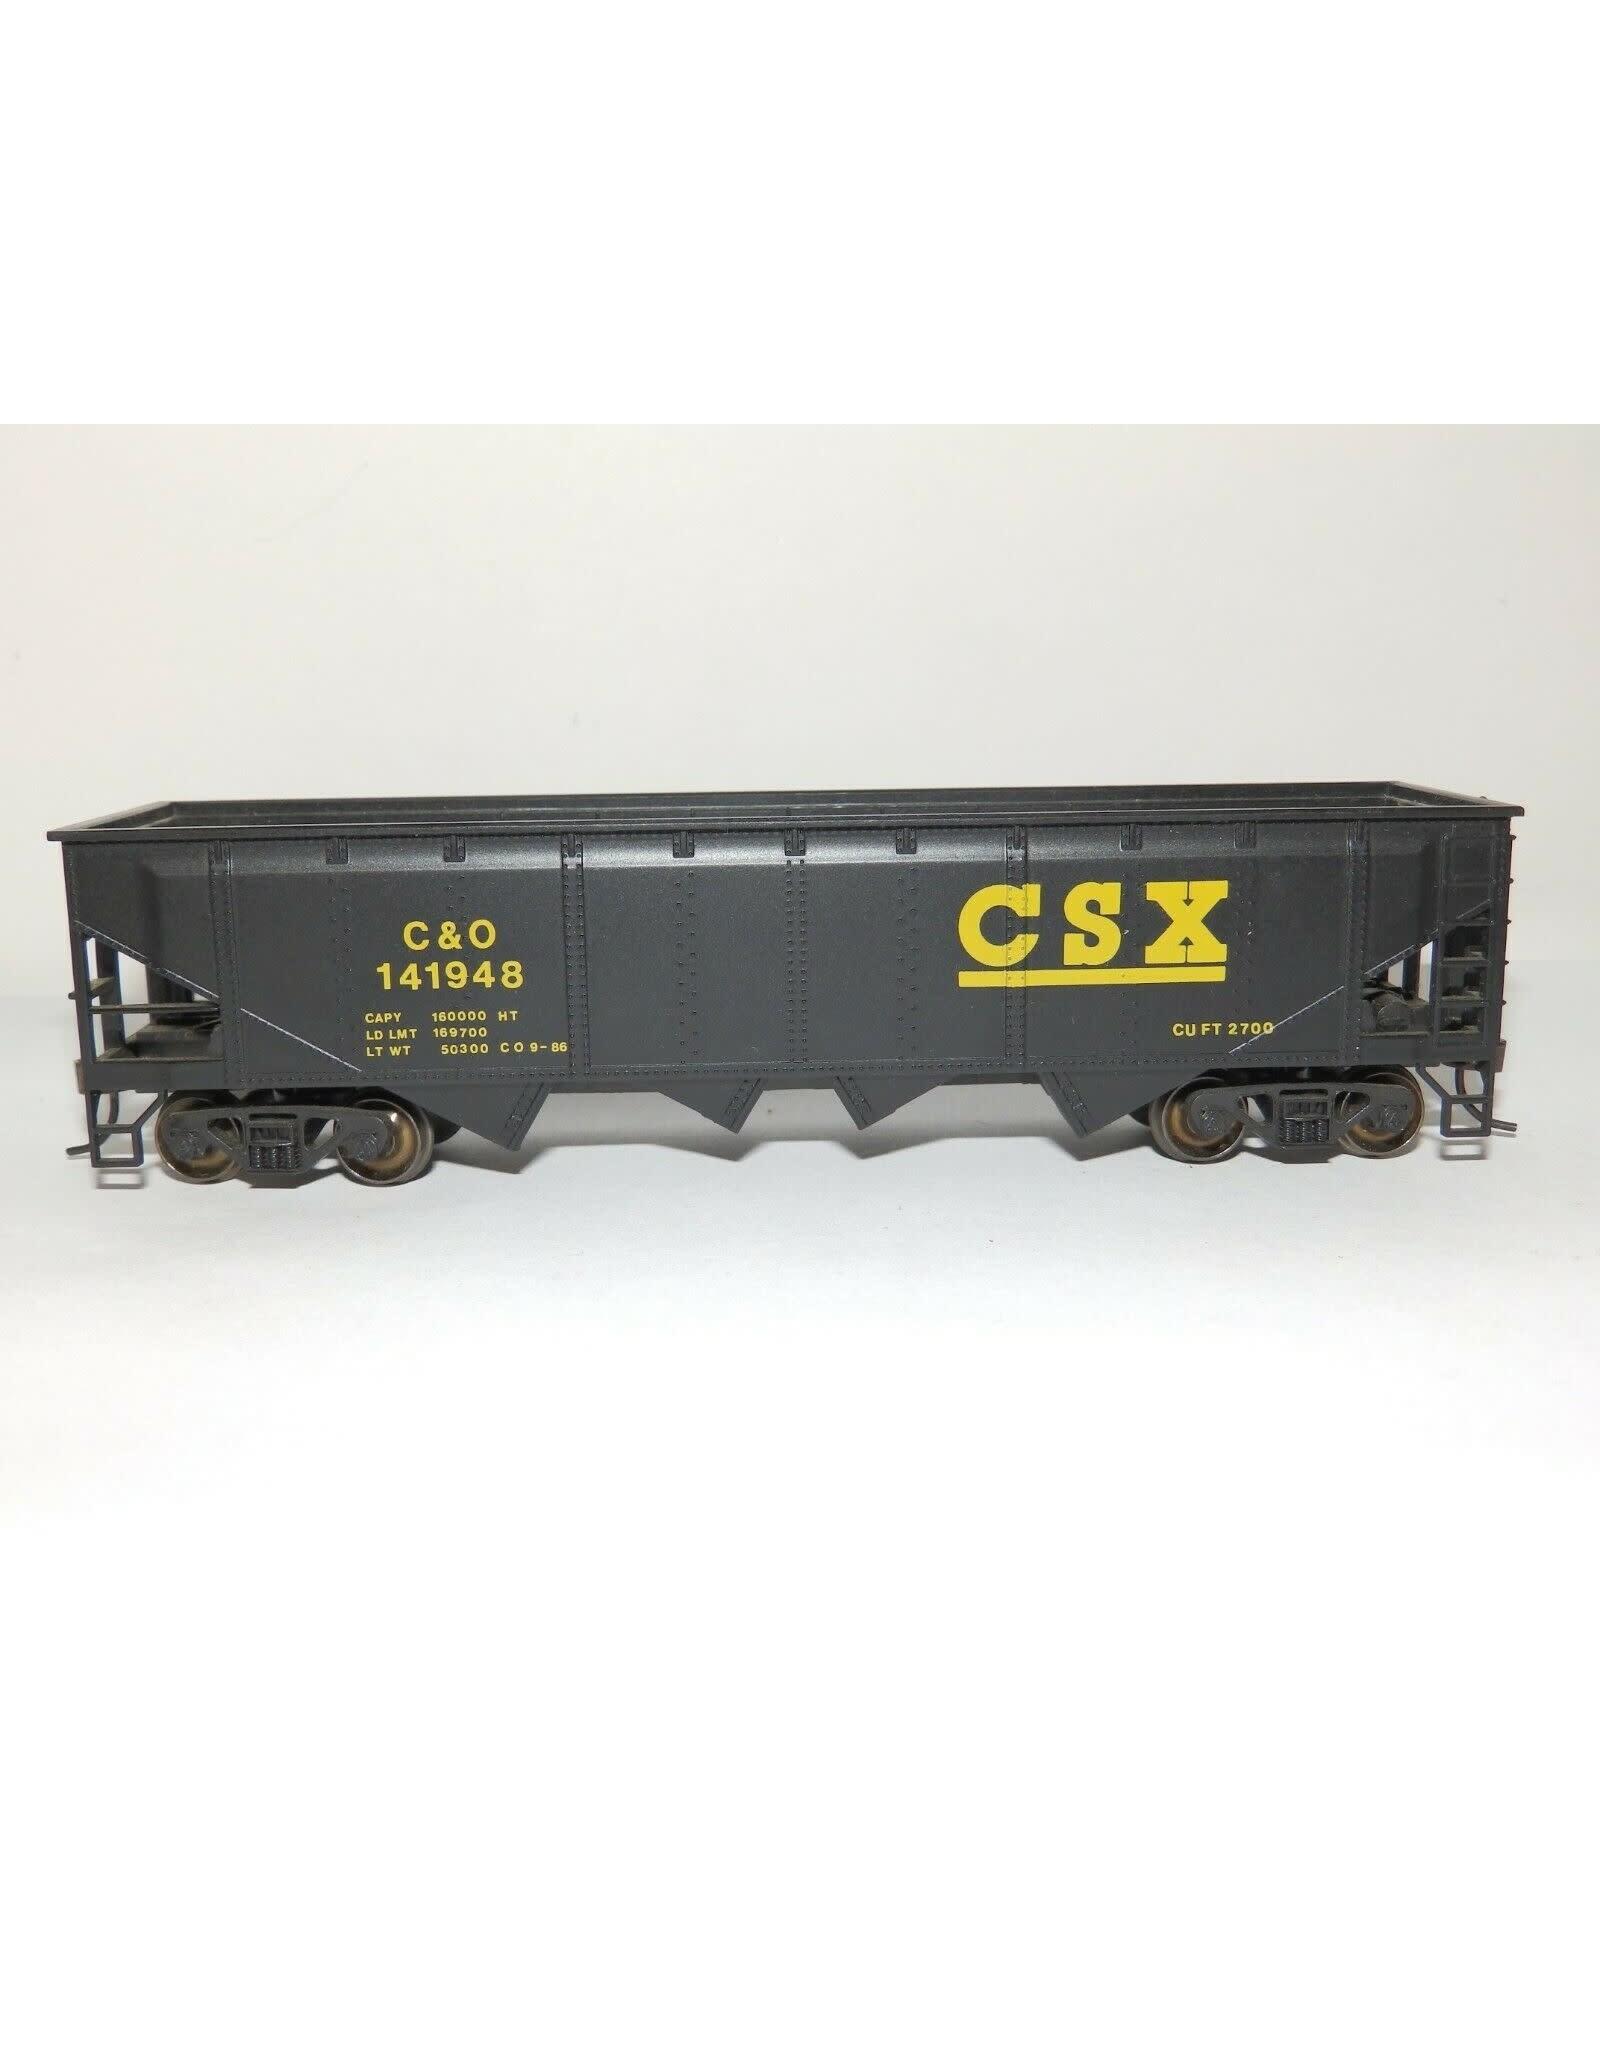 Bachmann BACHMANN SILVER HO scale CSX C&O #141948 QUAD HOPPER 40' KADEE'S & STEEL WHEELS